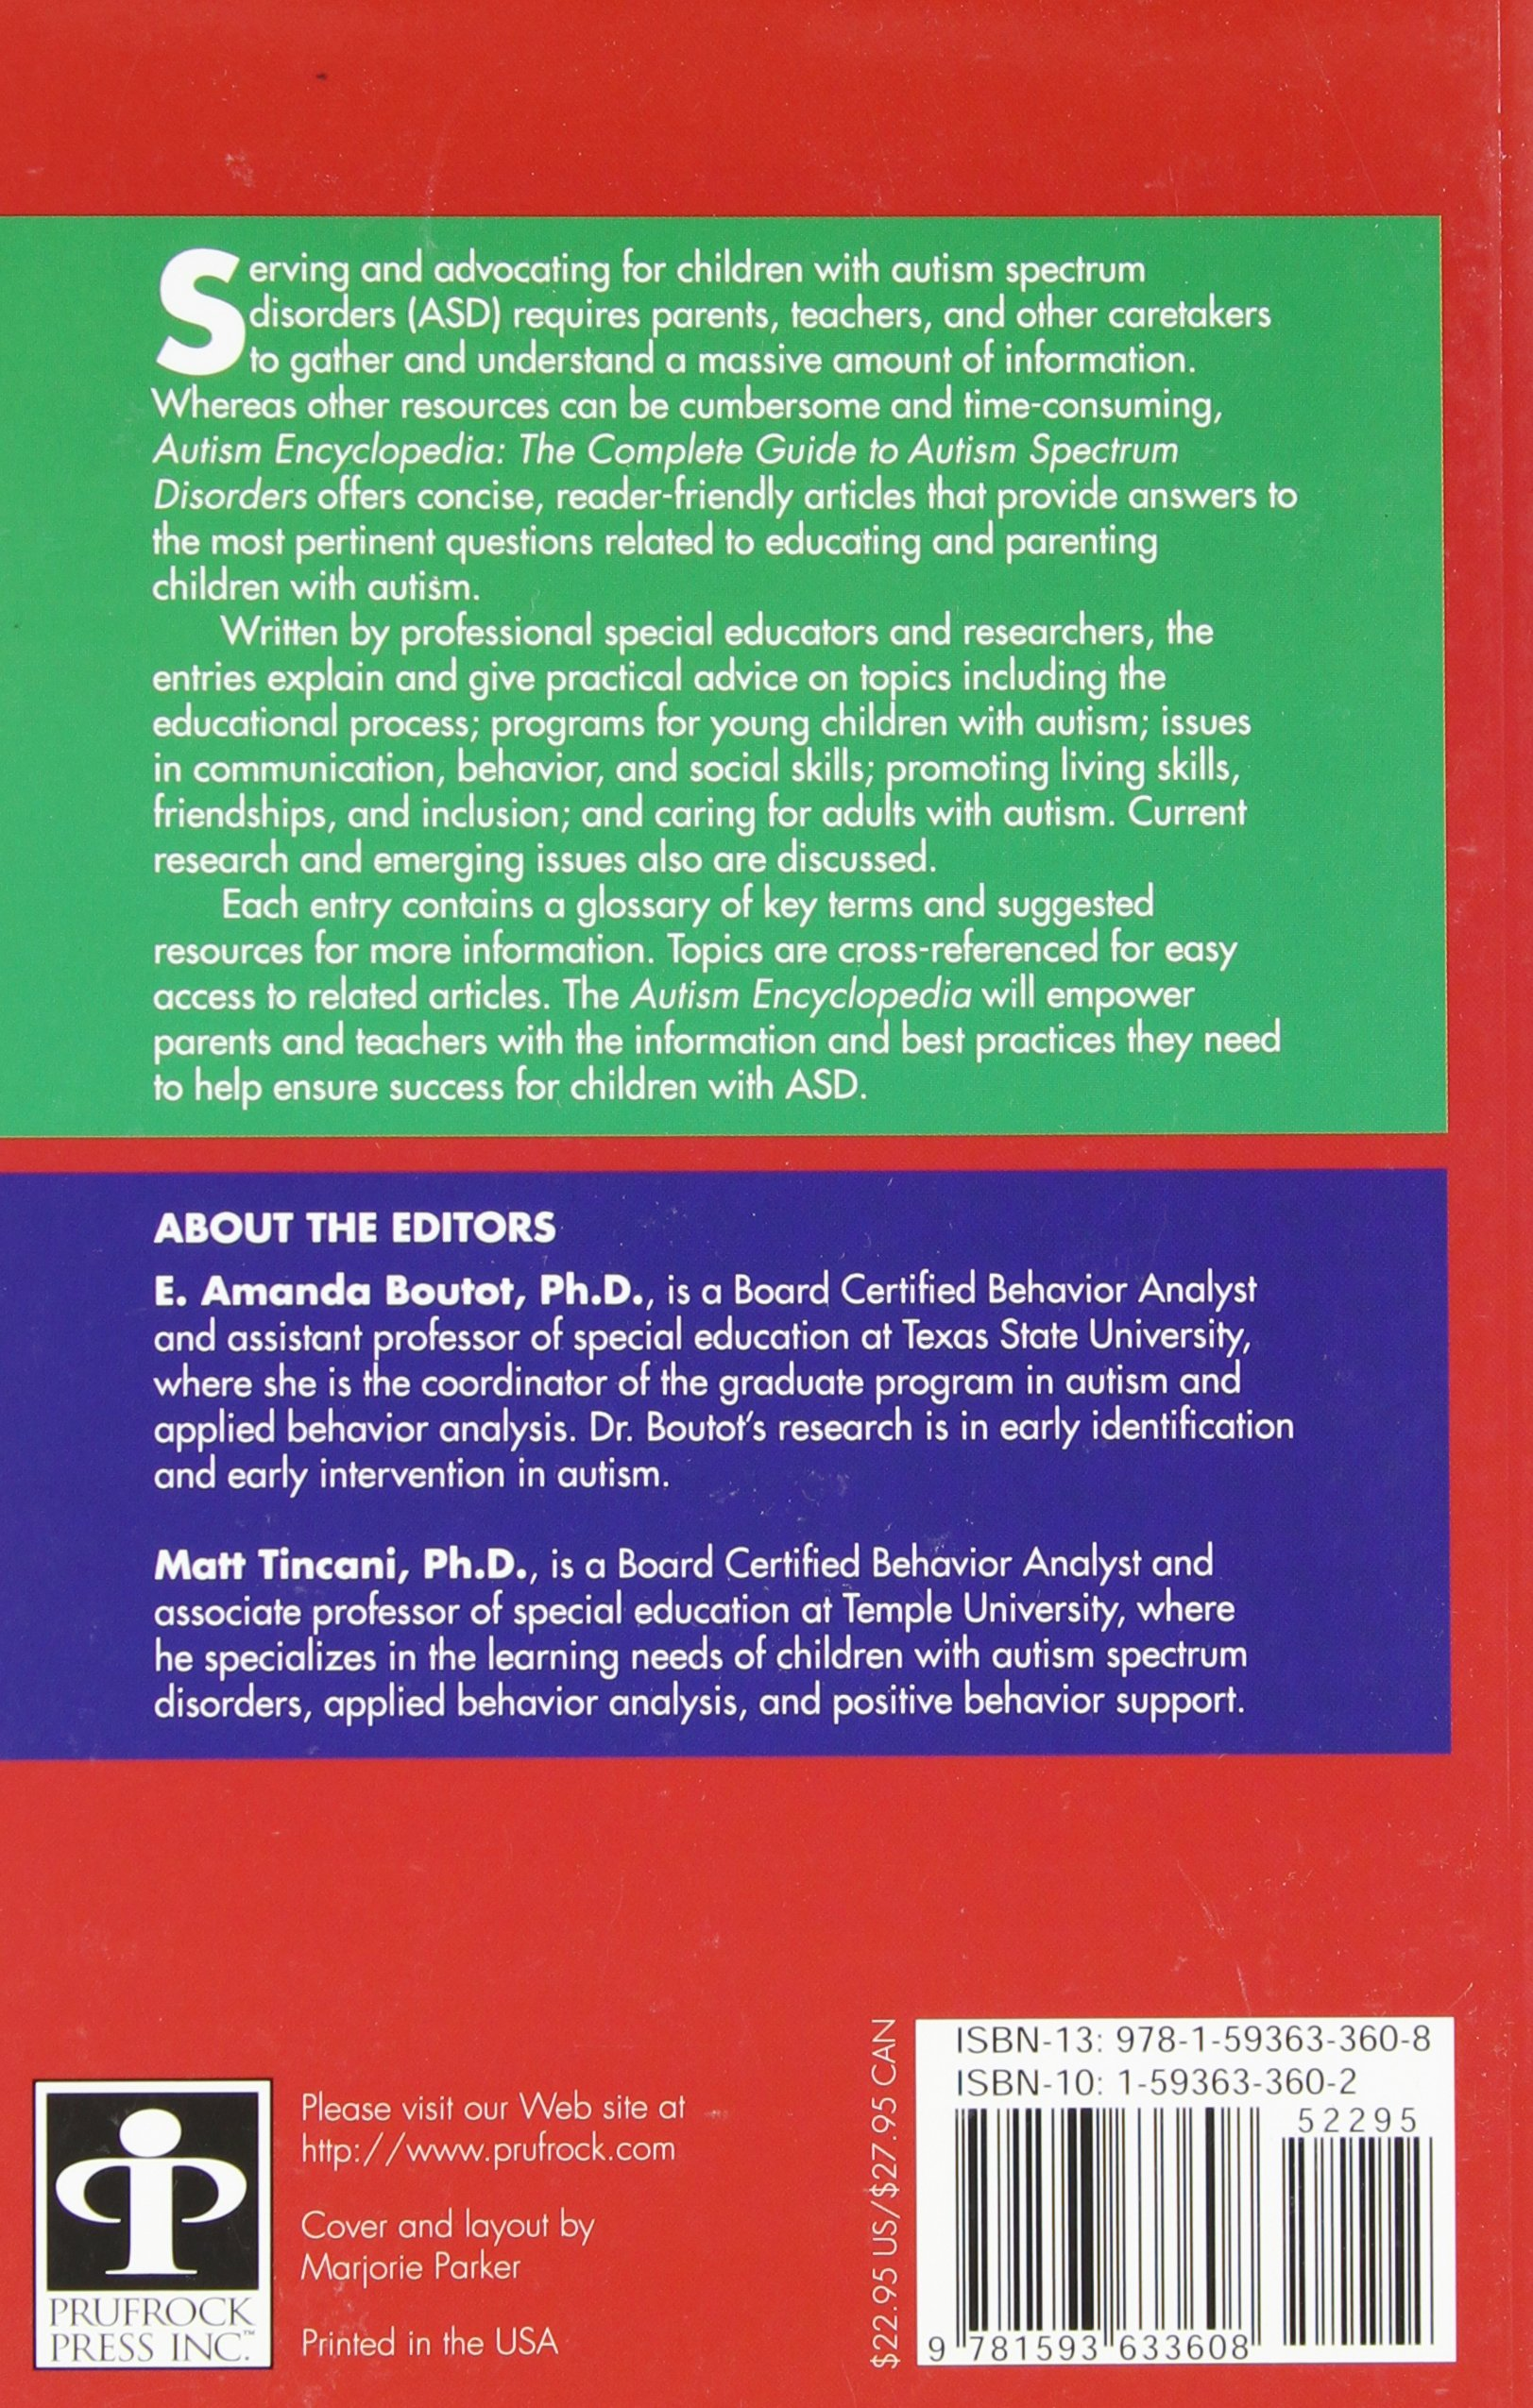 Autism Encyclopedia The plete Guide to Autism Spectrum